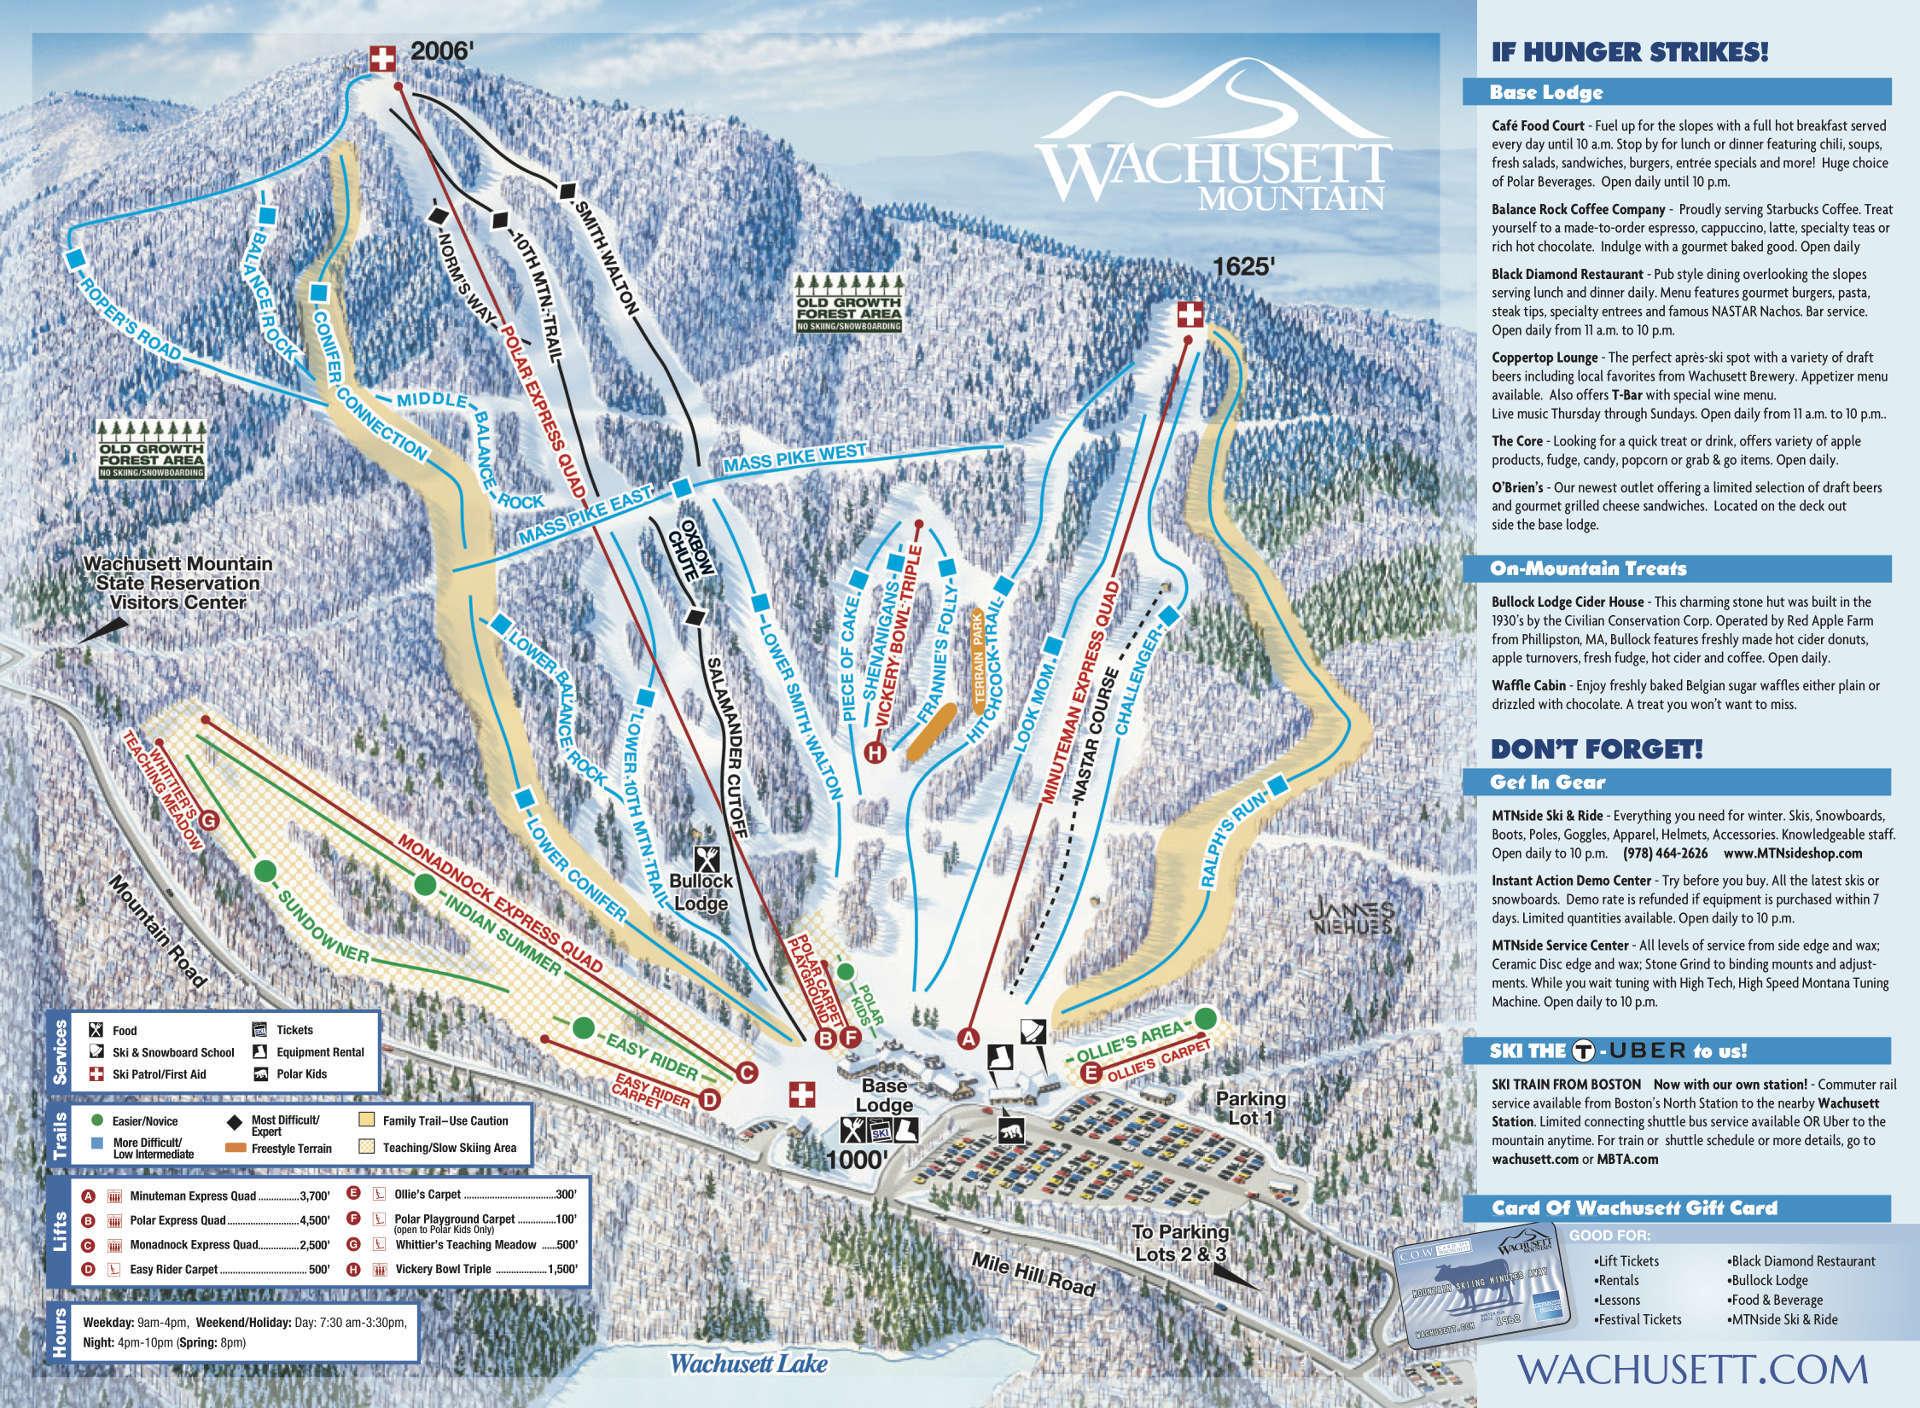 Wachusett Mountain Ski Area Piste / Trail Map